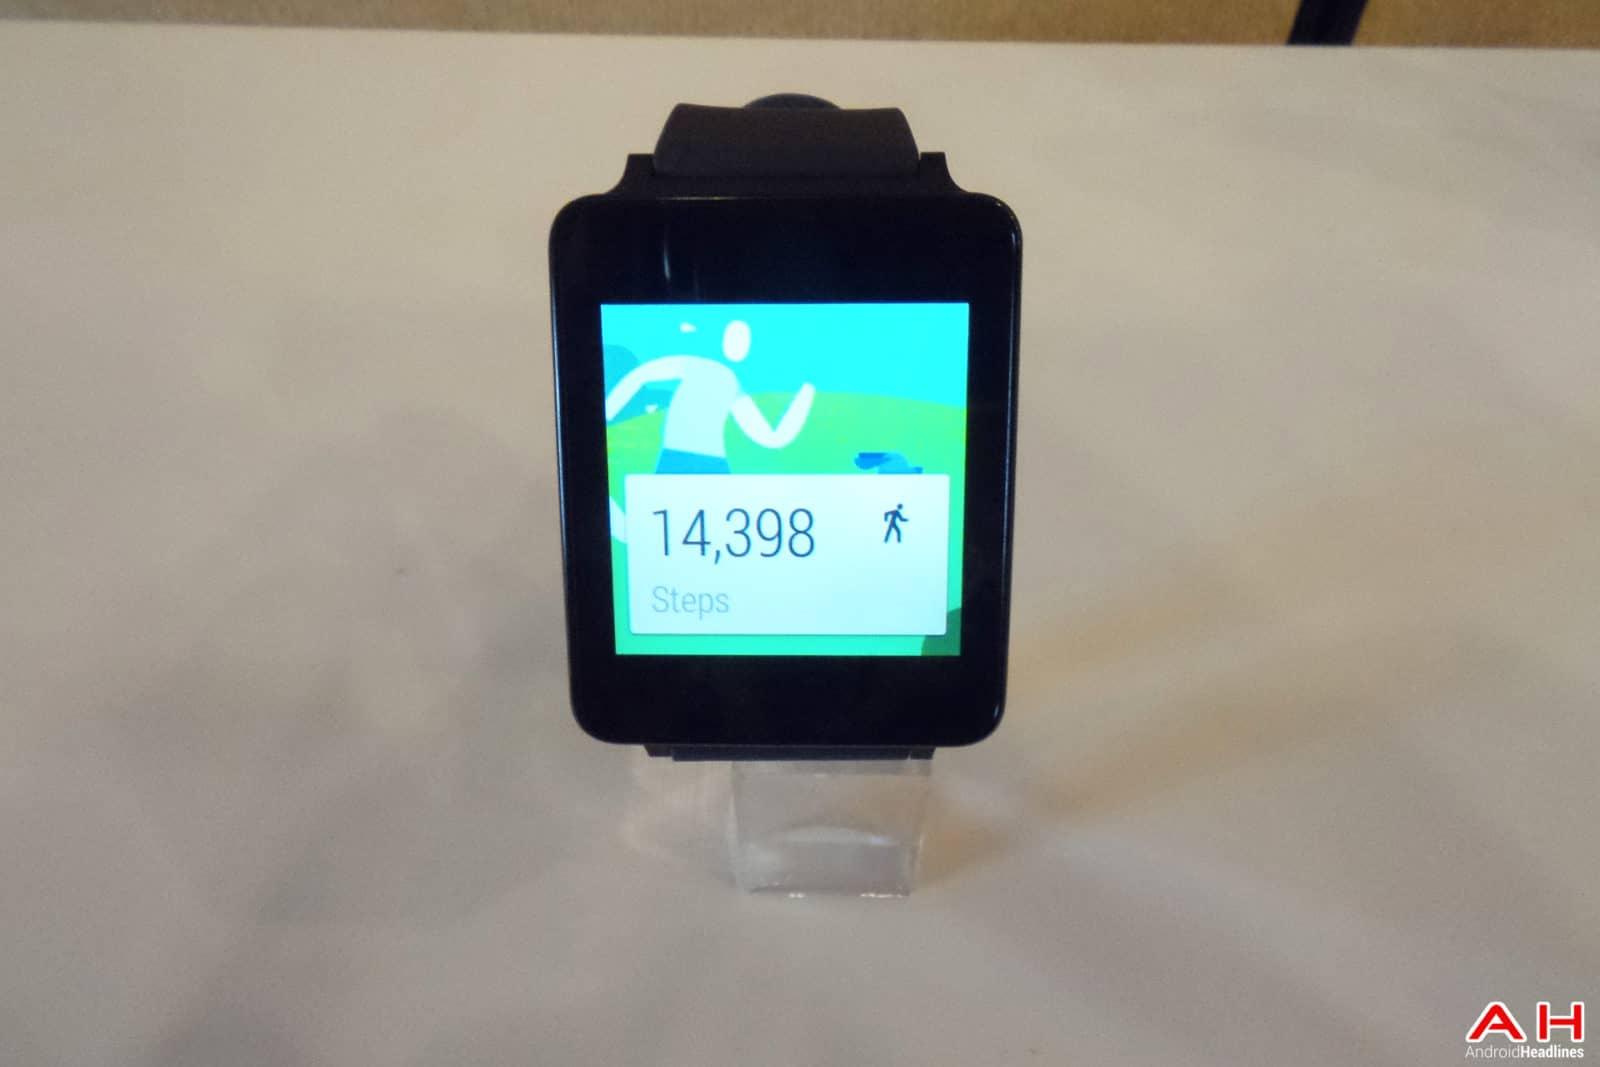 AH Google IO 2014 LG G Watch (4 of 10)